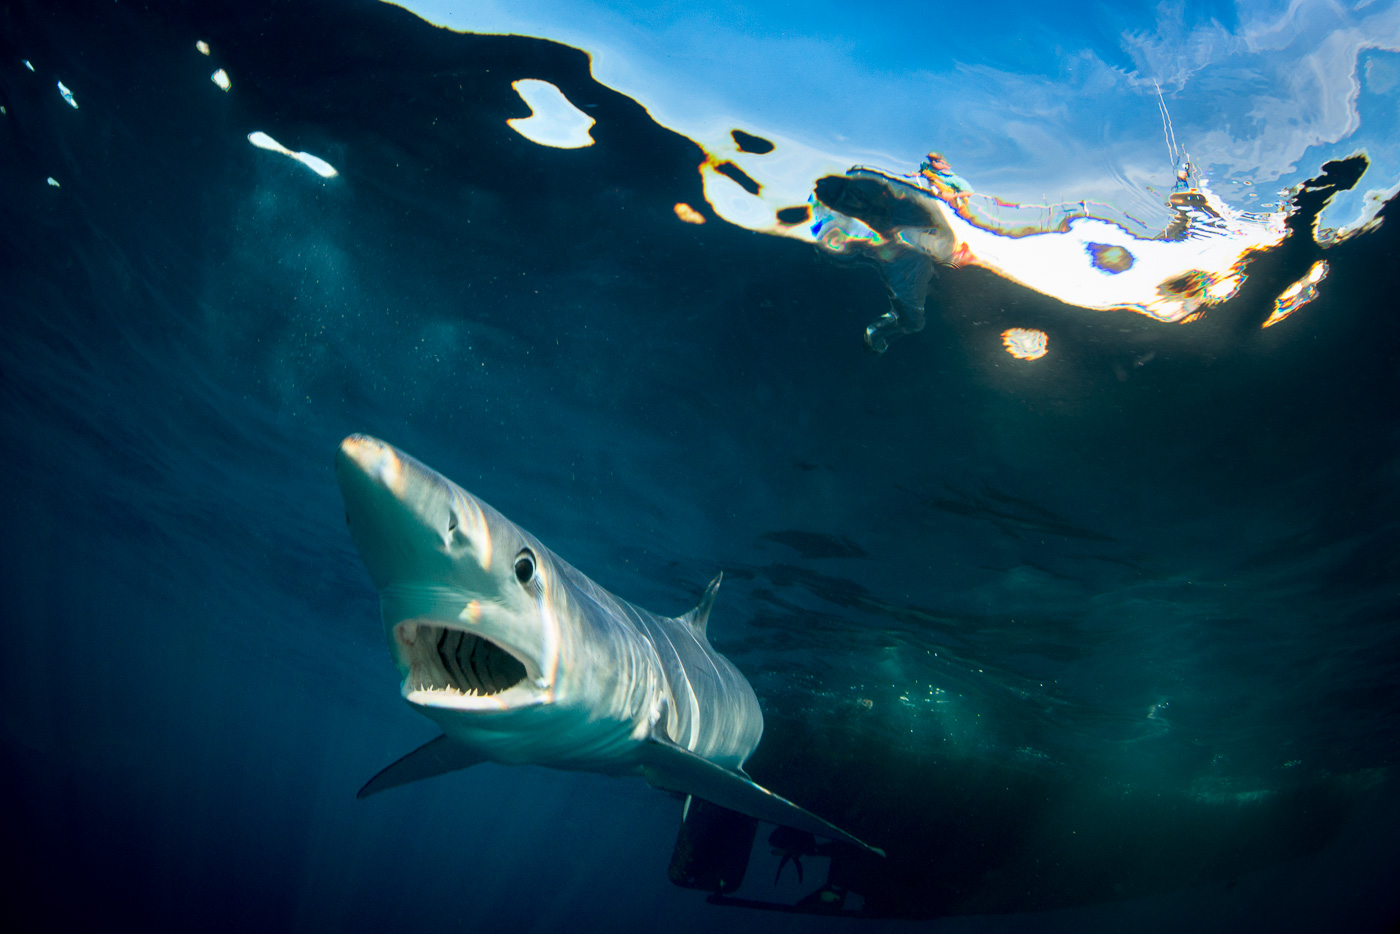 blue shark swim underwater open mouth